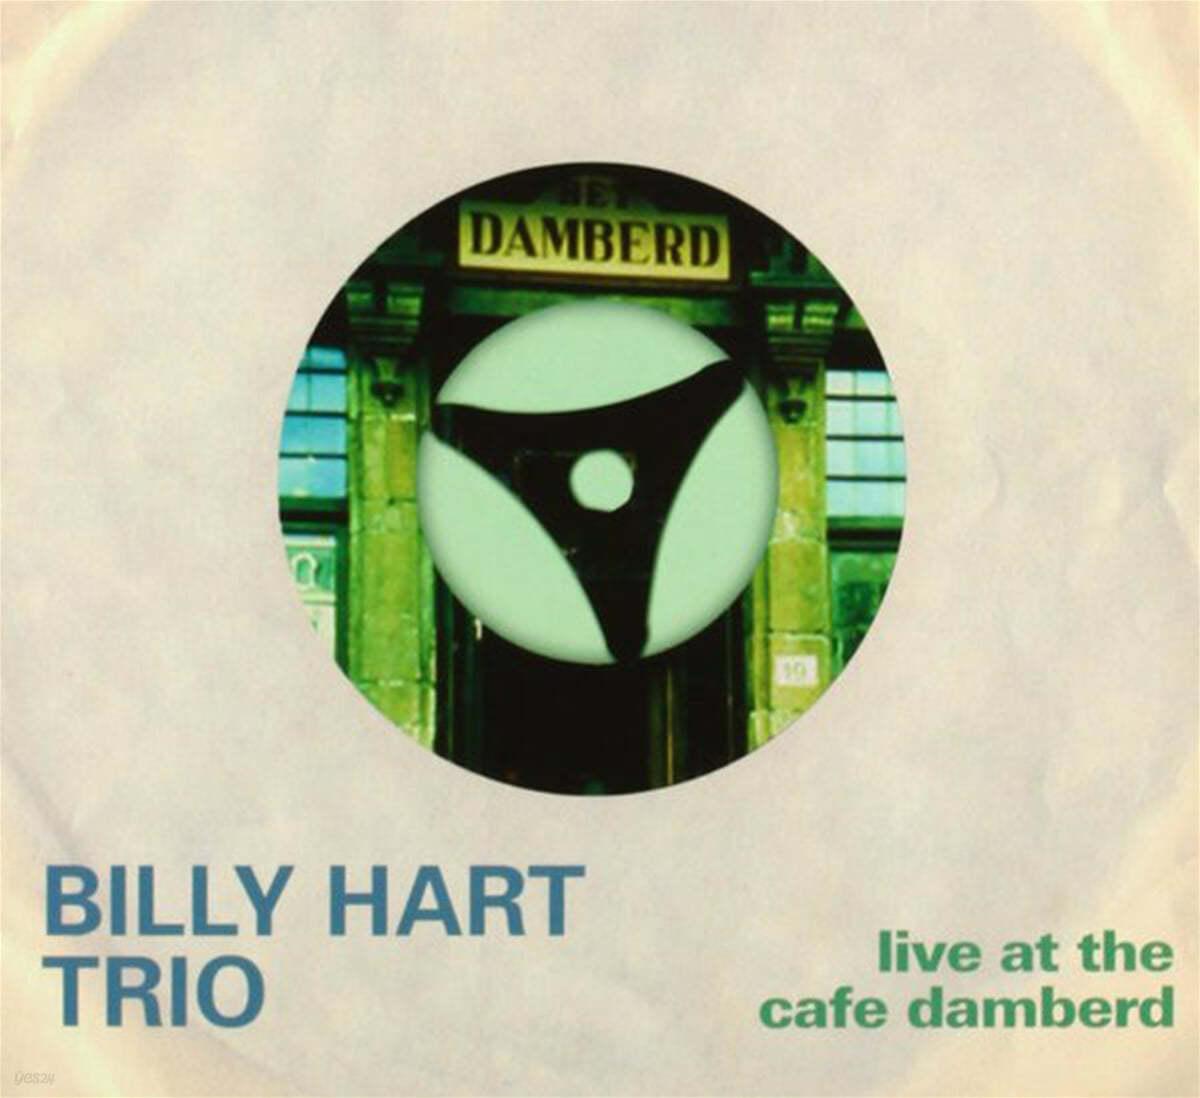 Billy Hart Trio (빌리 하트 트리오) - Live At The Cafe Damberd